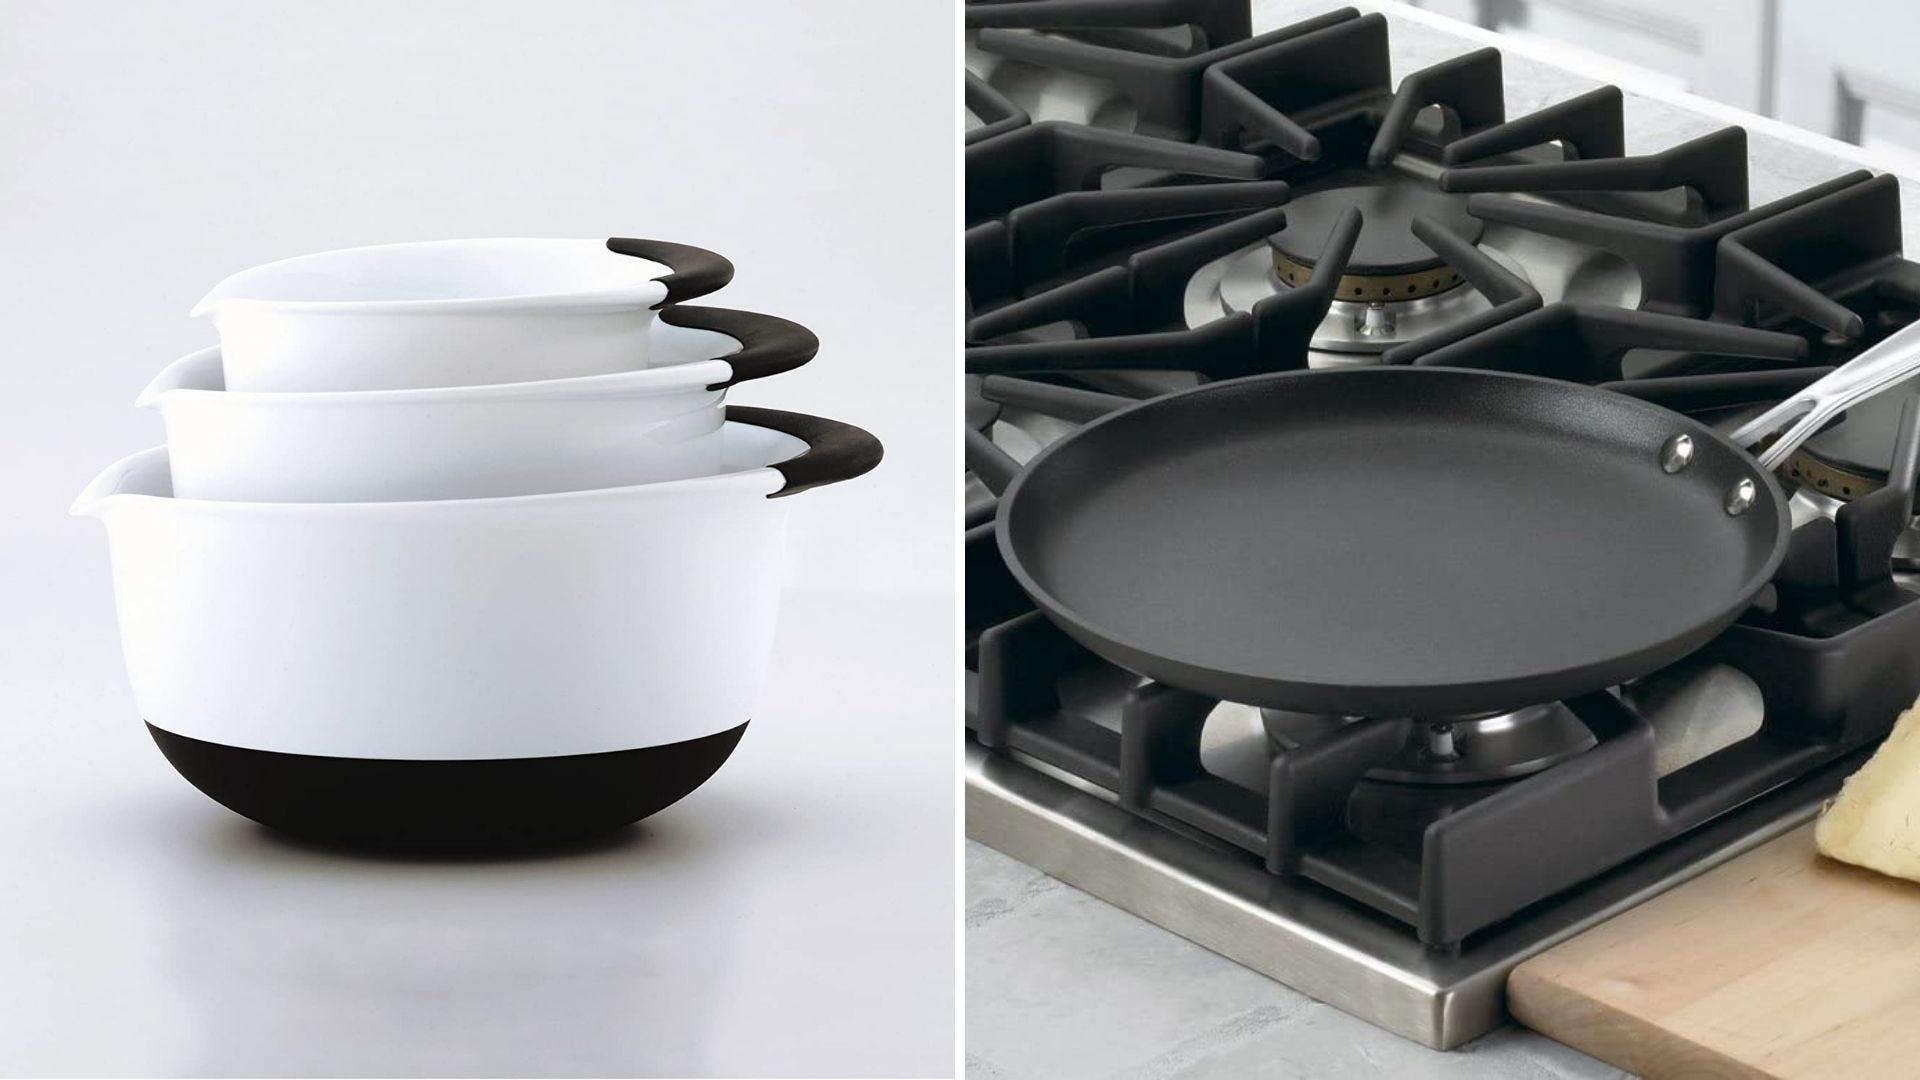 A set of mixing bowls and a crepe pan